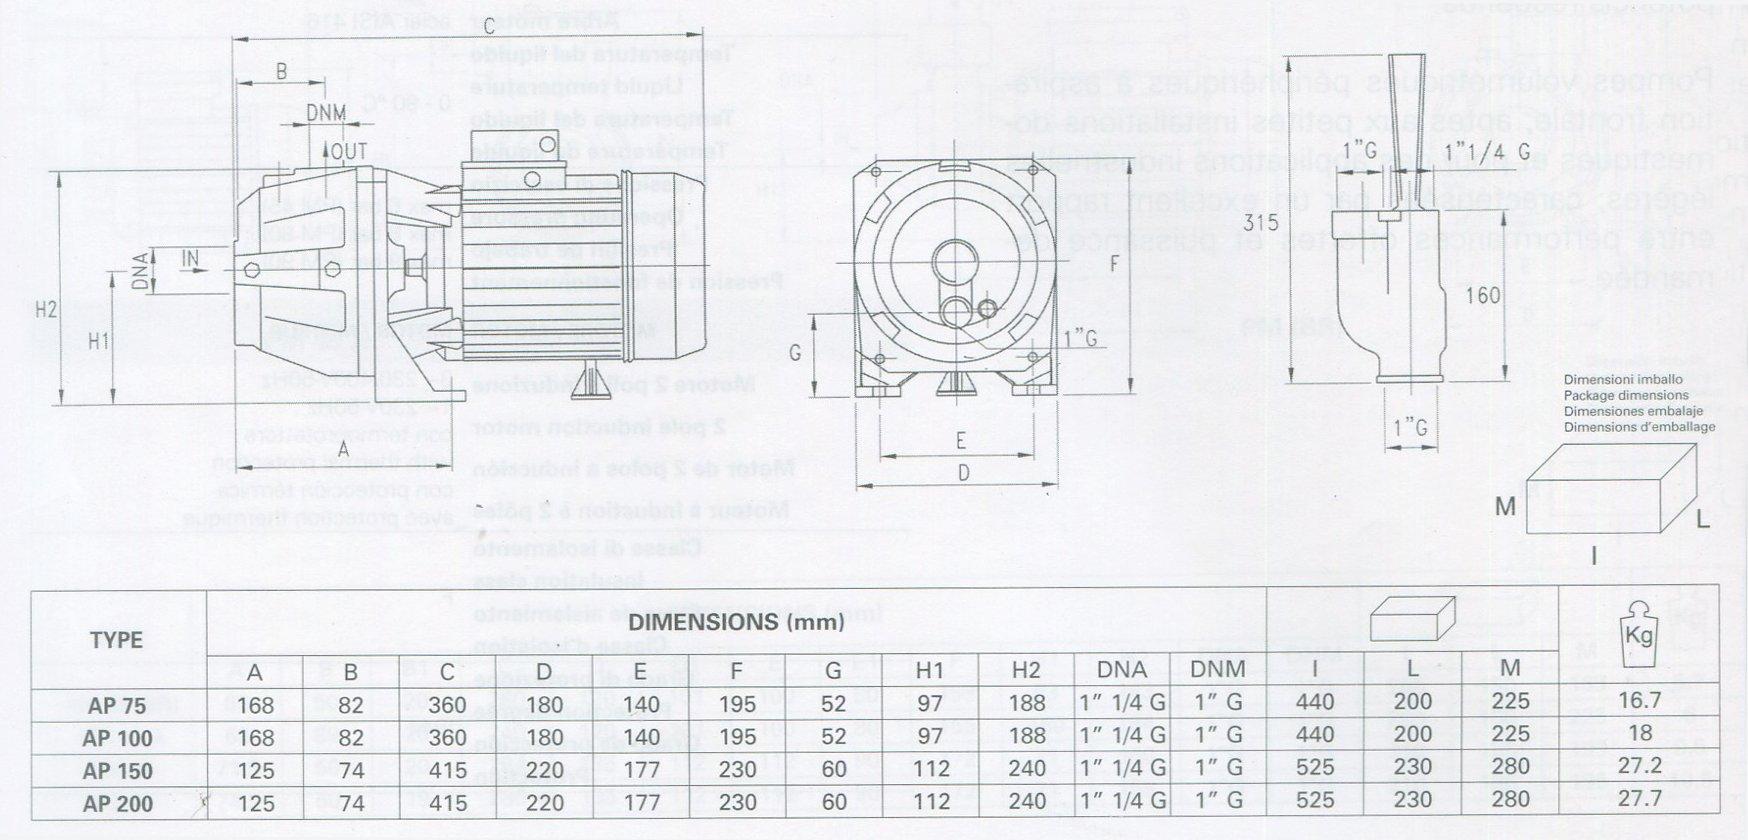 https://maybompentax.com.vn/images/2013/12/May-bom-pentax-trang15-duong-dac-tinh-02.jpg